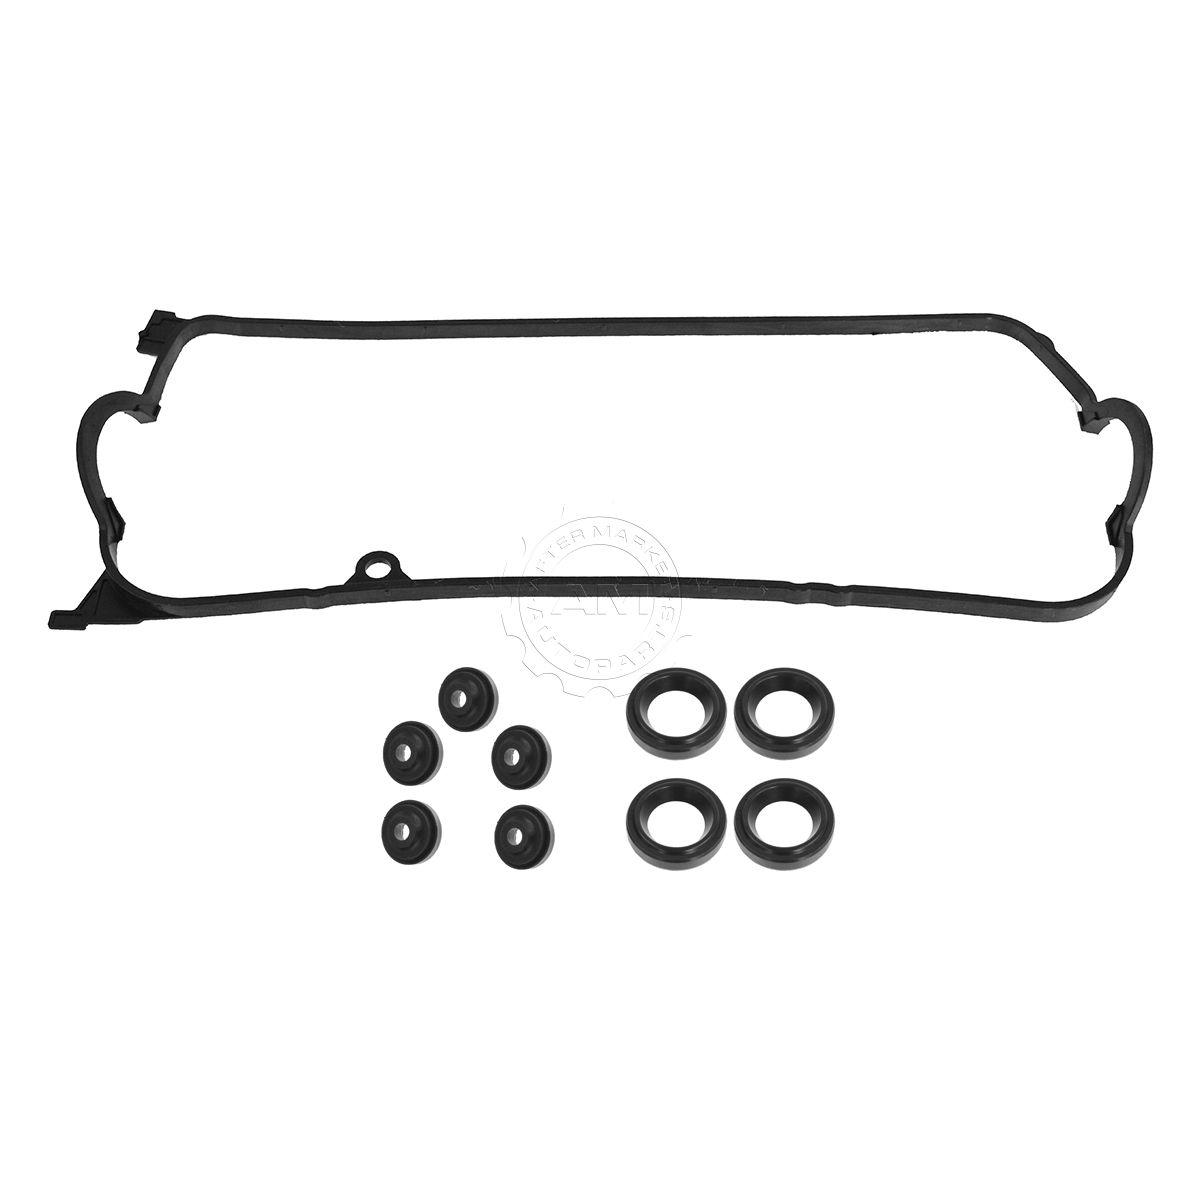 Valve Cover Gasket Set Kit for 01-05 Acura EL Honda Civic L4 1.7L